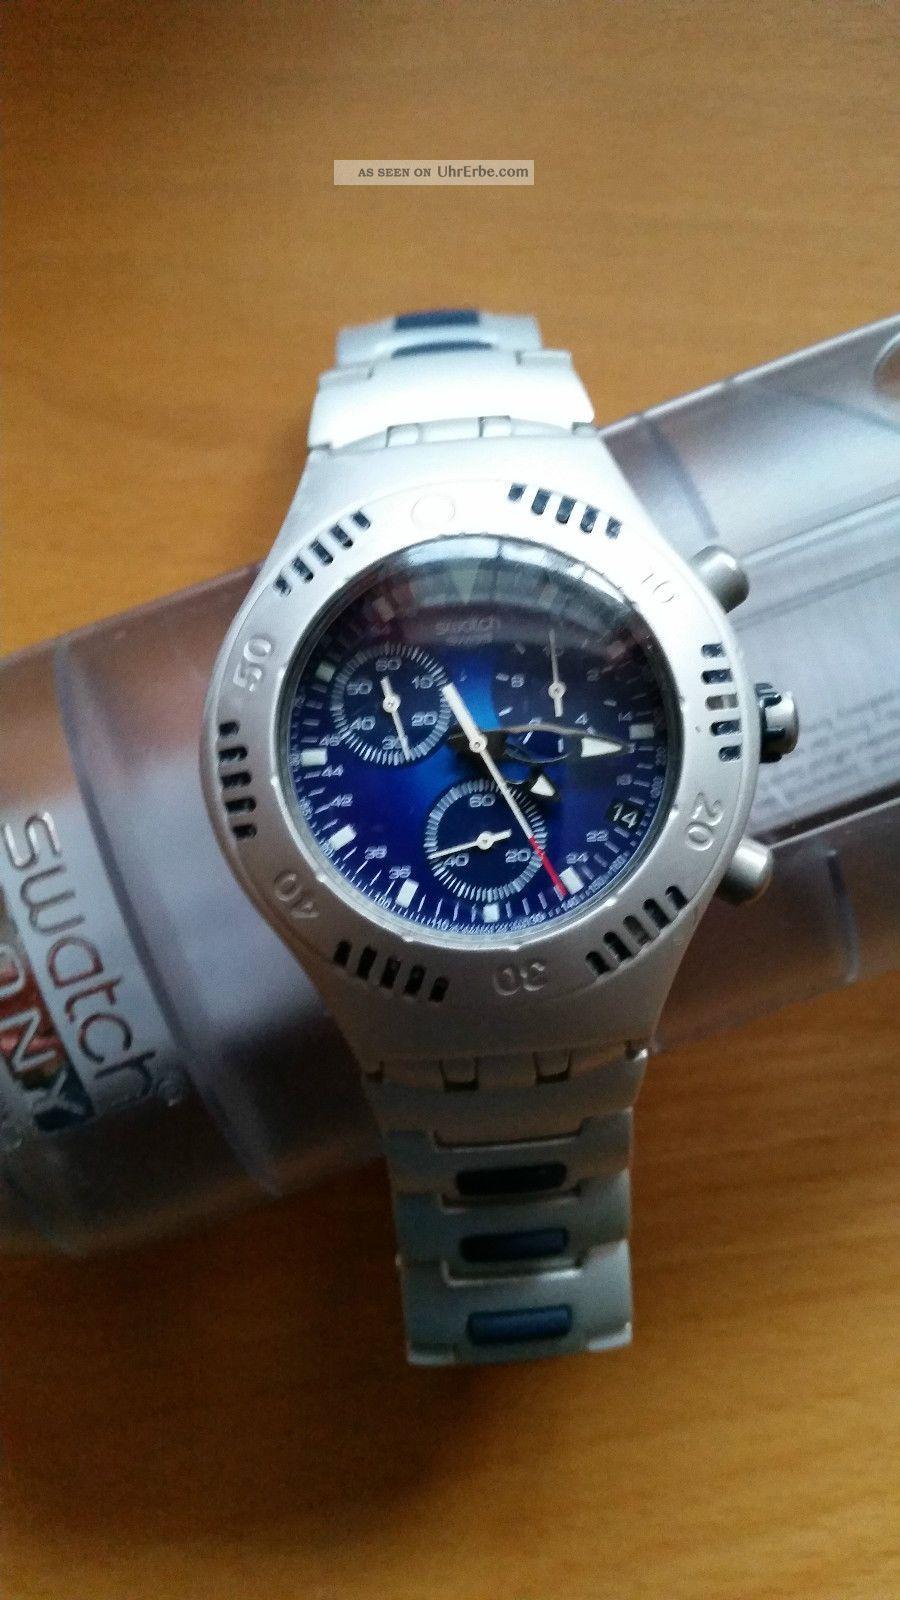 Herren Chronograph Swatch Irony Scuba 200 Chrono Mit Ovp Armbanduhren Bild